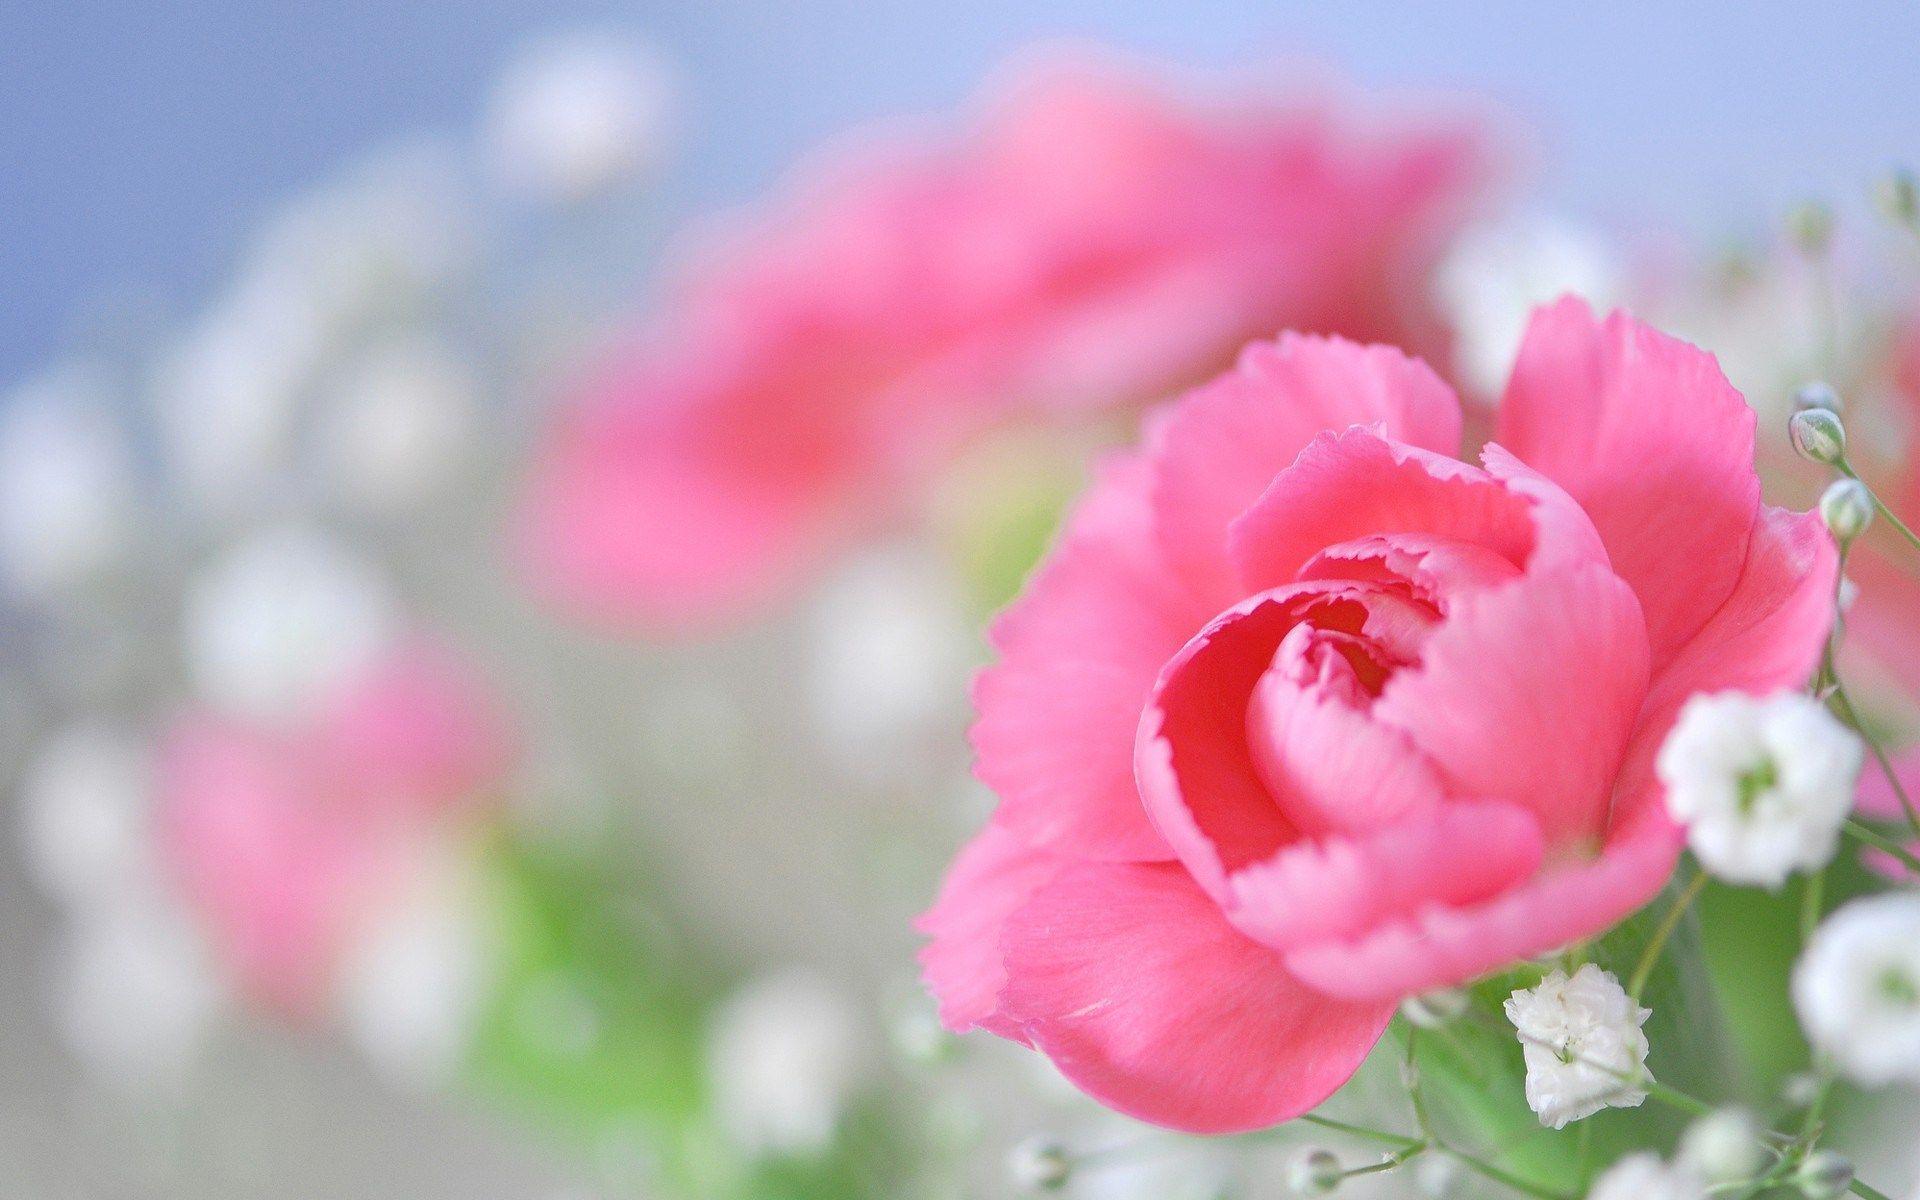 Peony Flower Wallpapers Wallpaper Cave Цветы, Розы и Пионы